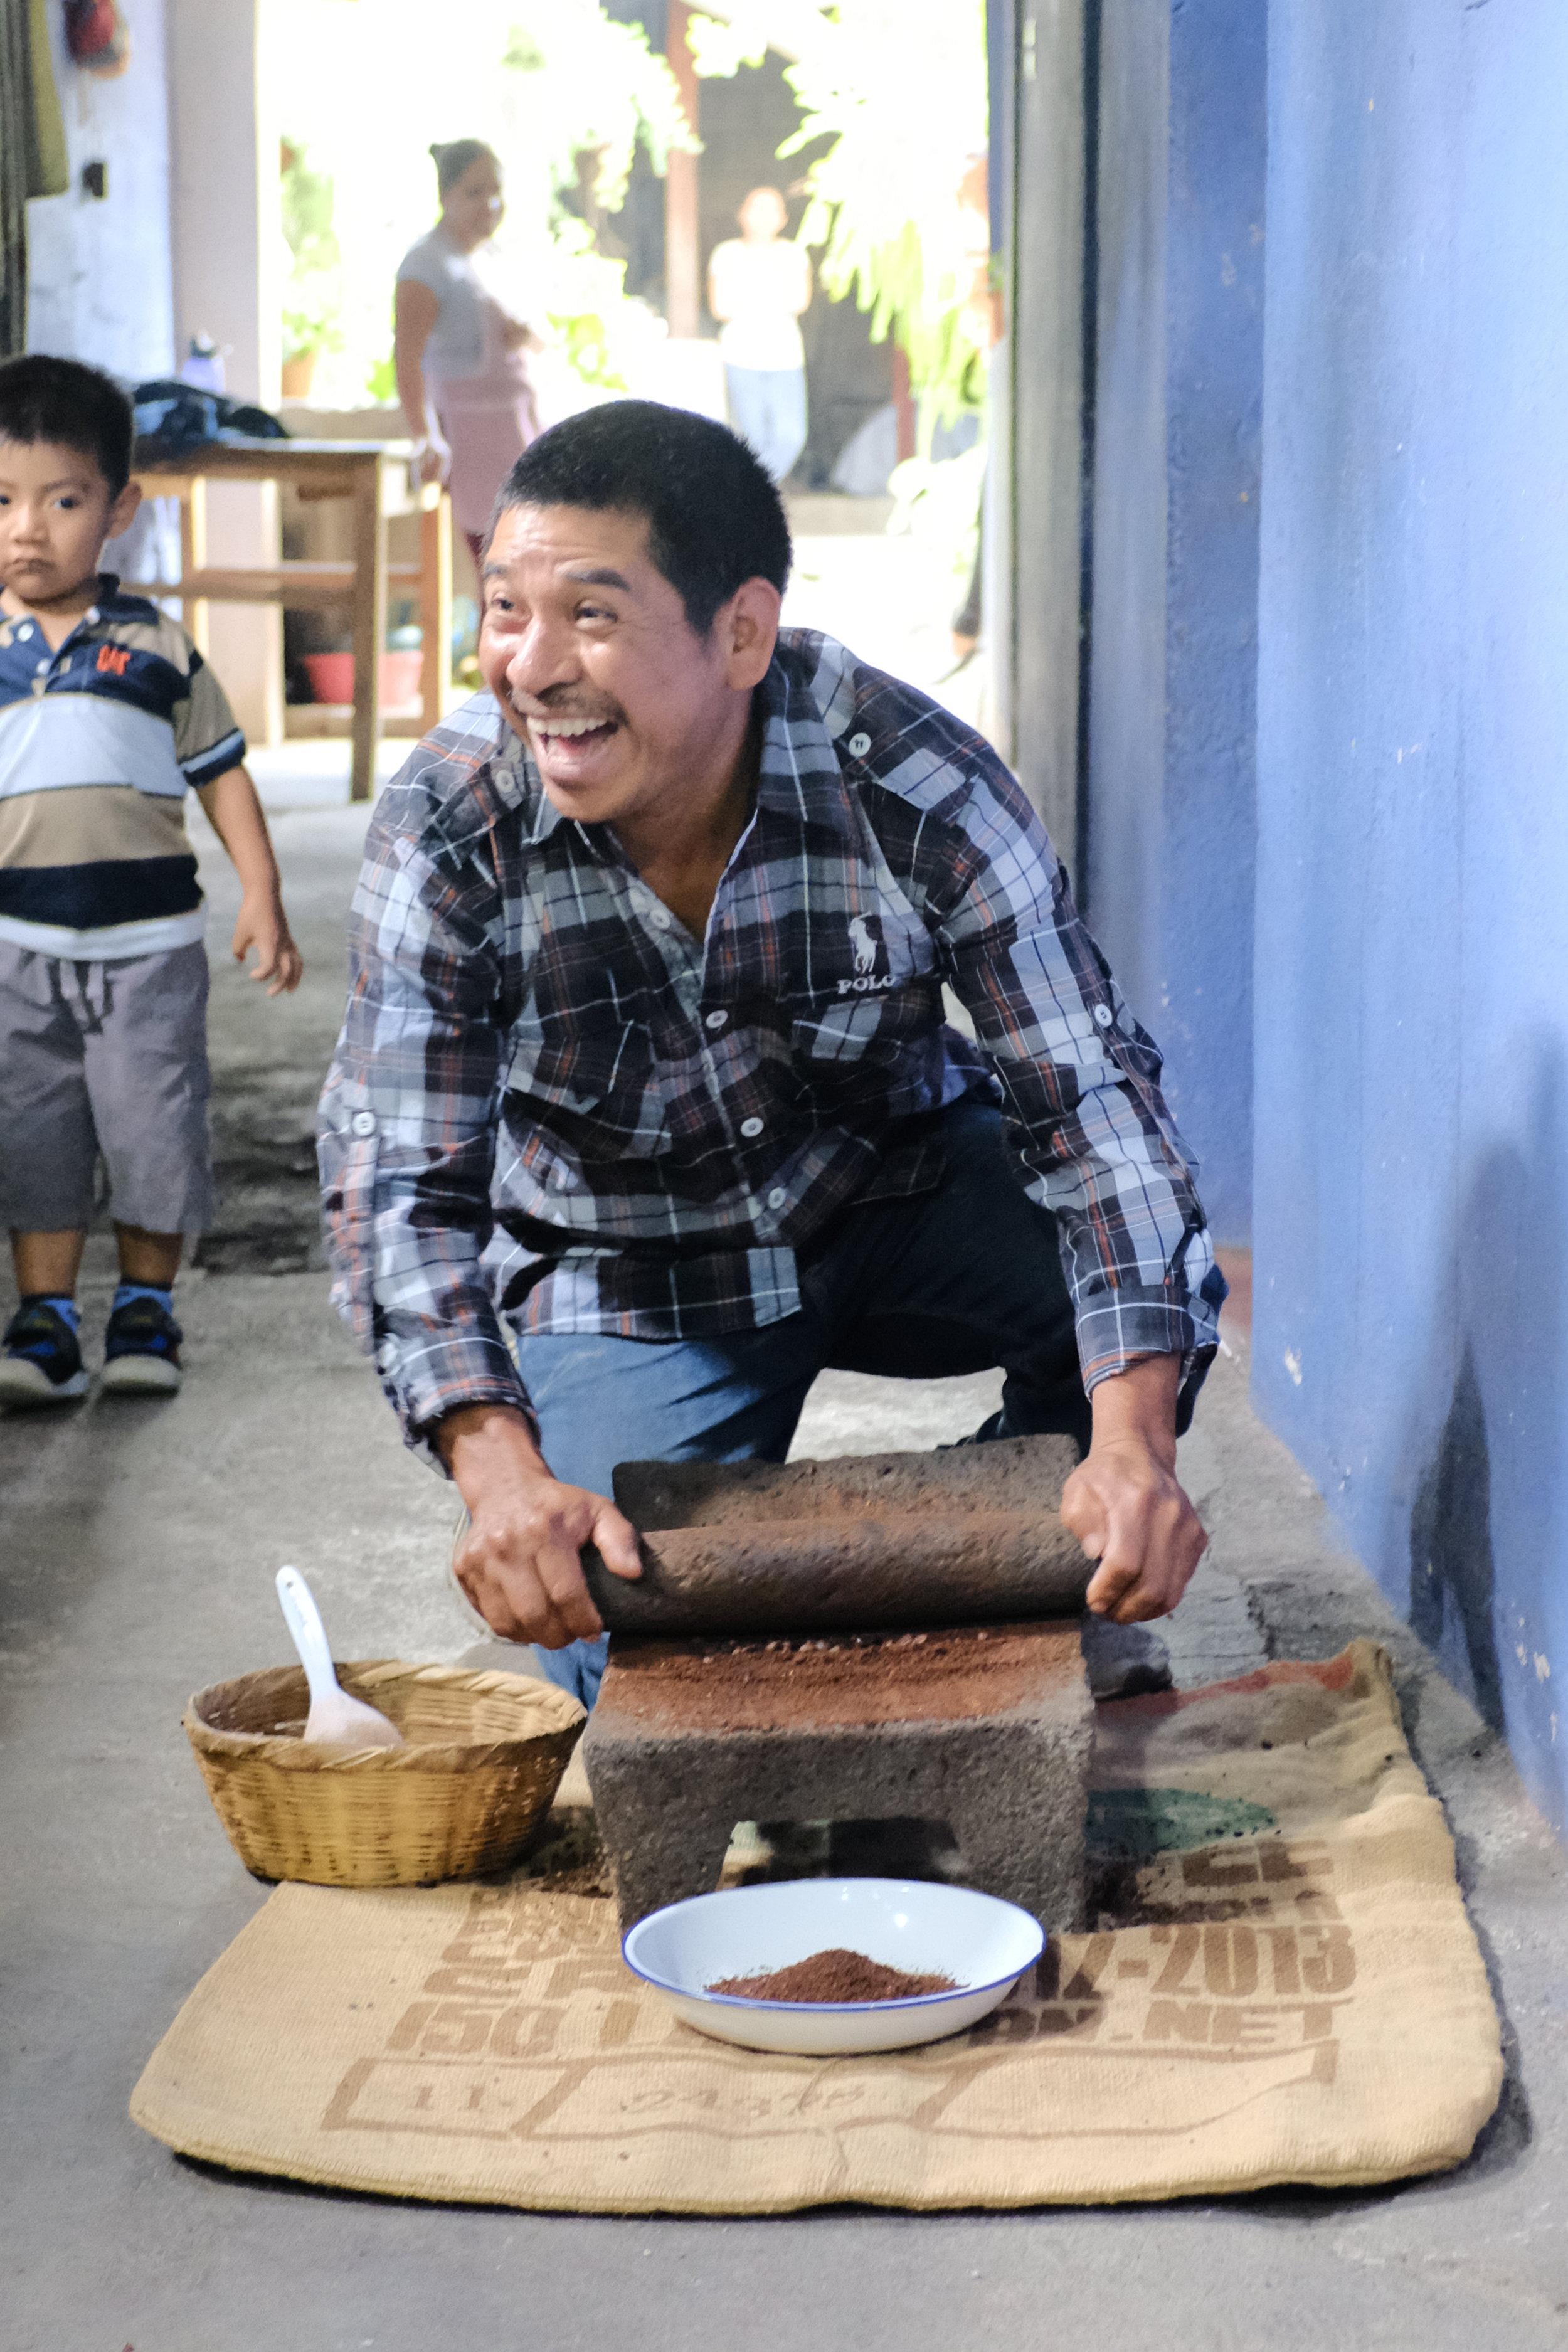 Eugenio definitely enjoyed grinding coffee on a stone!